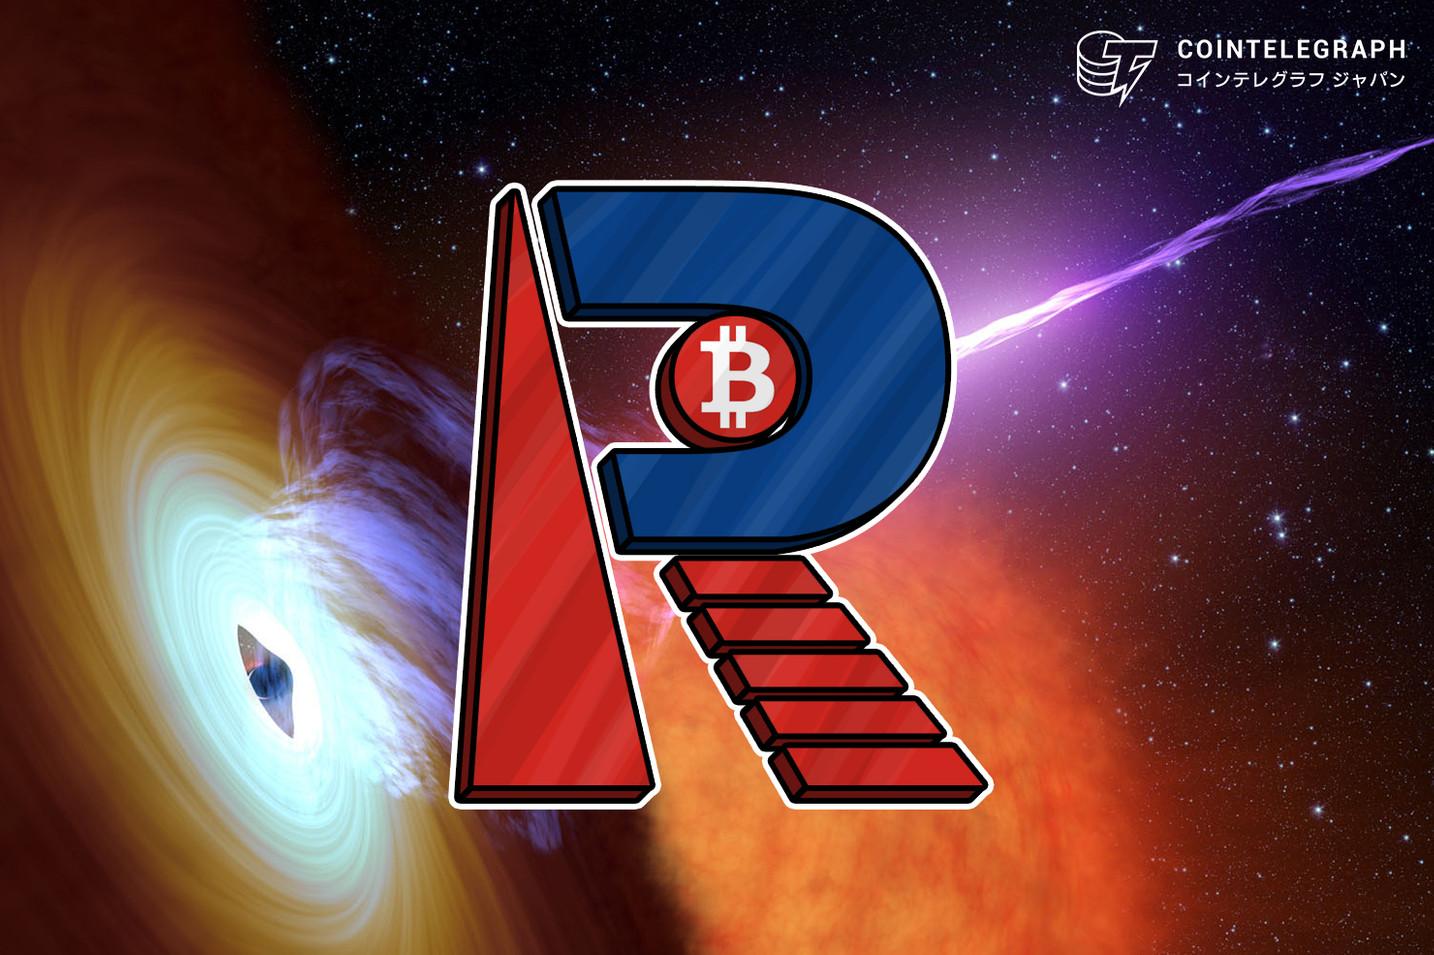 RAEX:誰でも参加できるデジタル資産取引市場